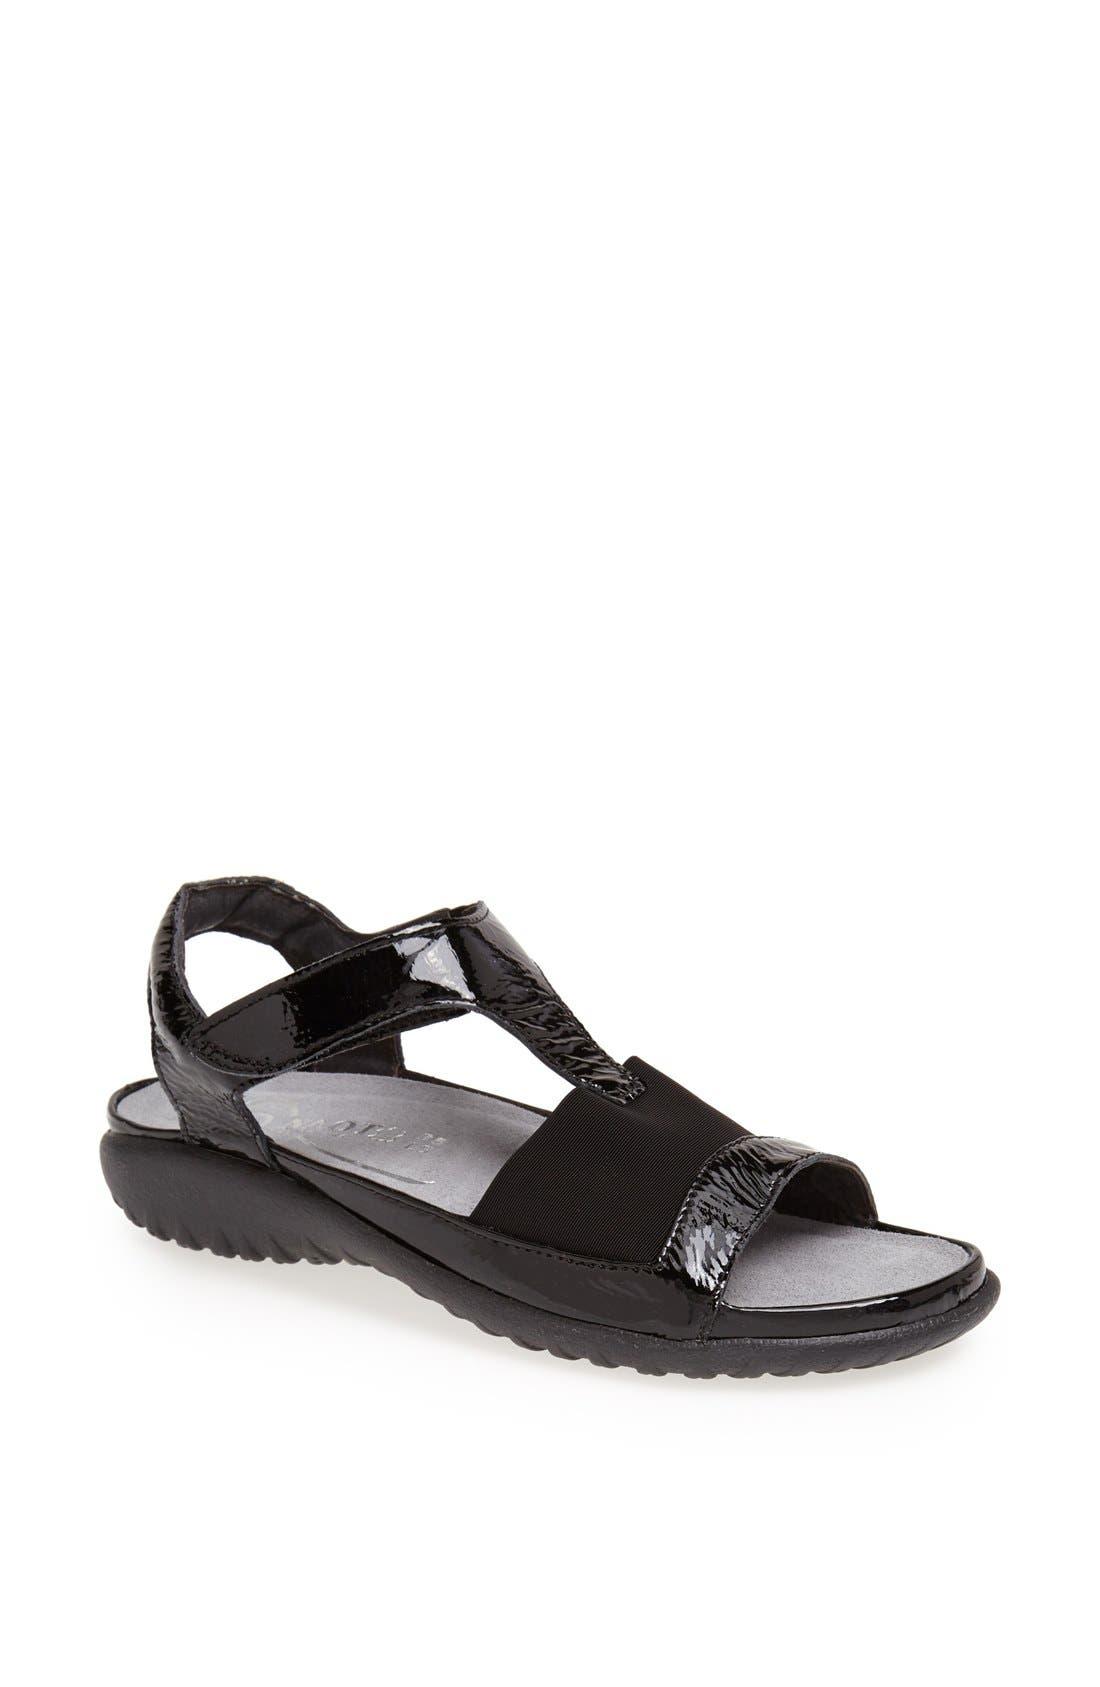 NAOT 'Marama' Sandal